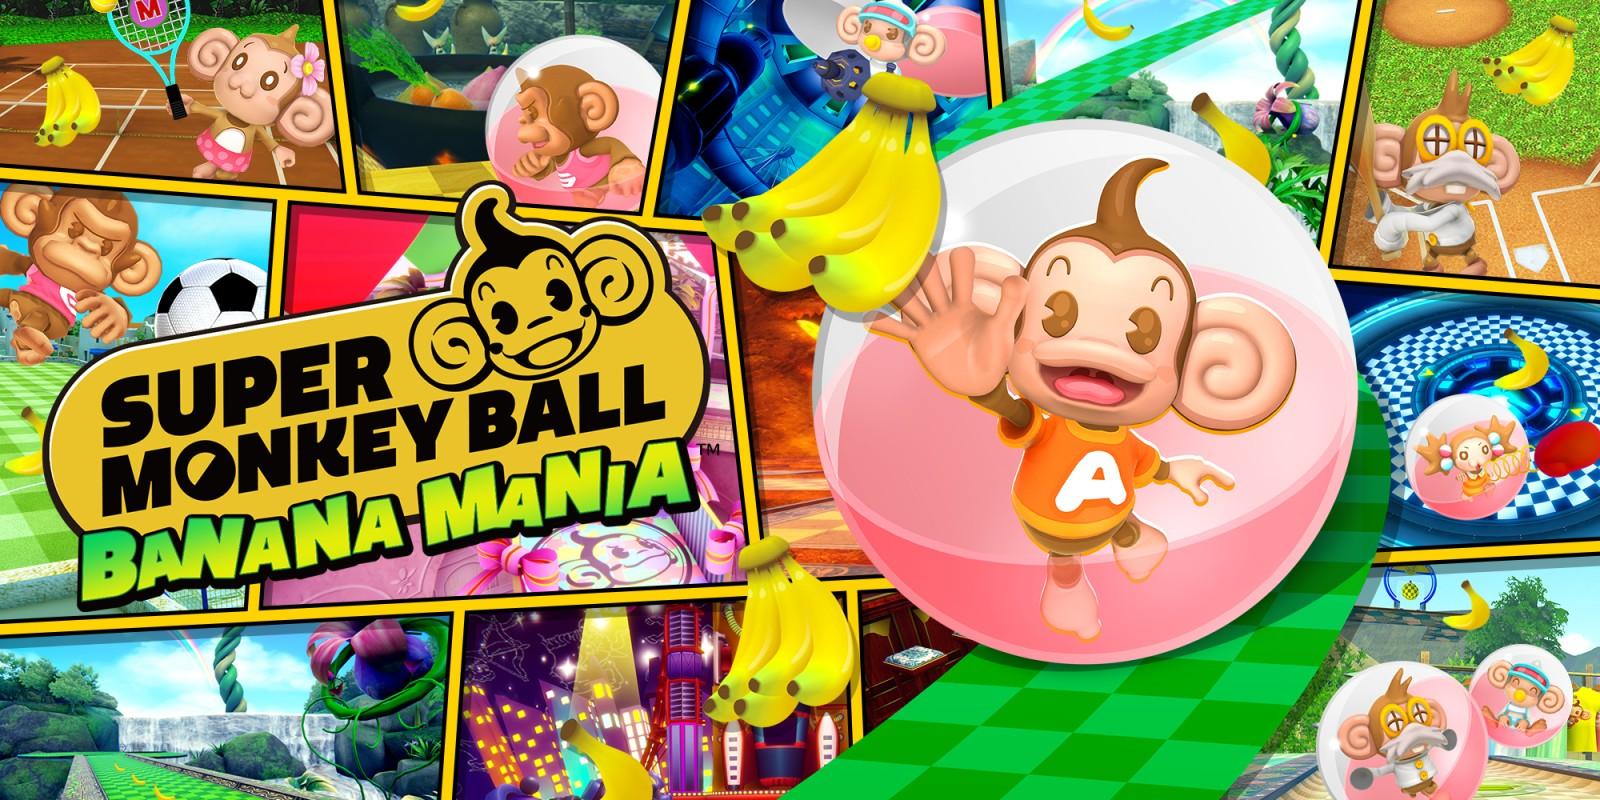 Super Monkey Ball Banana Mania | Nintendo Switch | Jeux | Nintendo